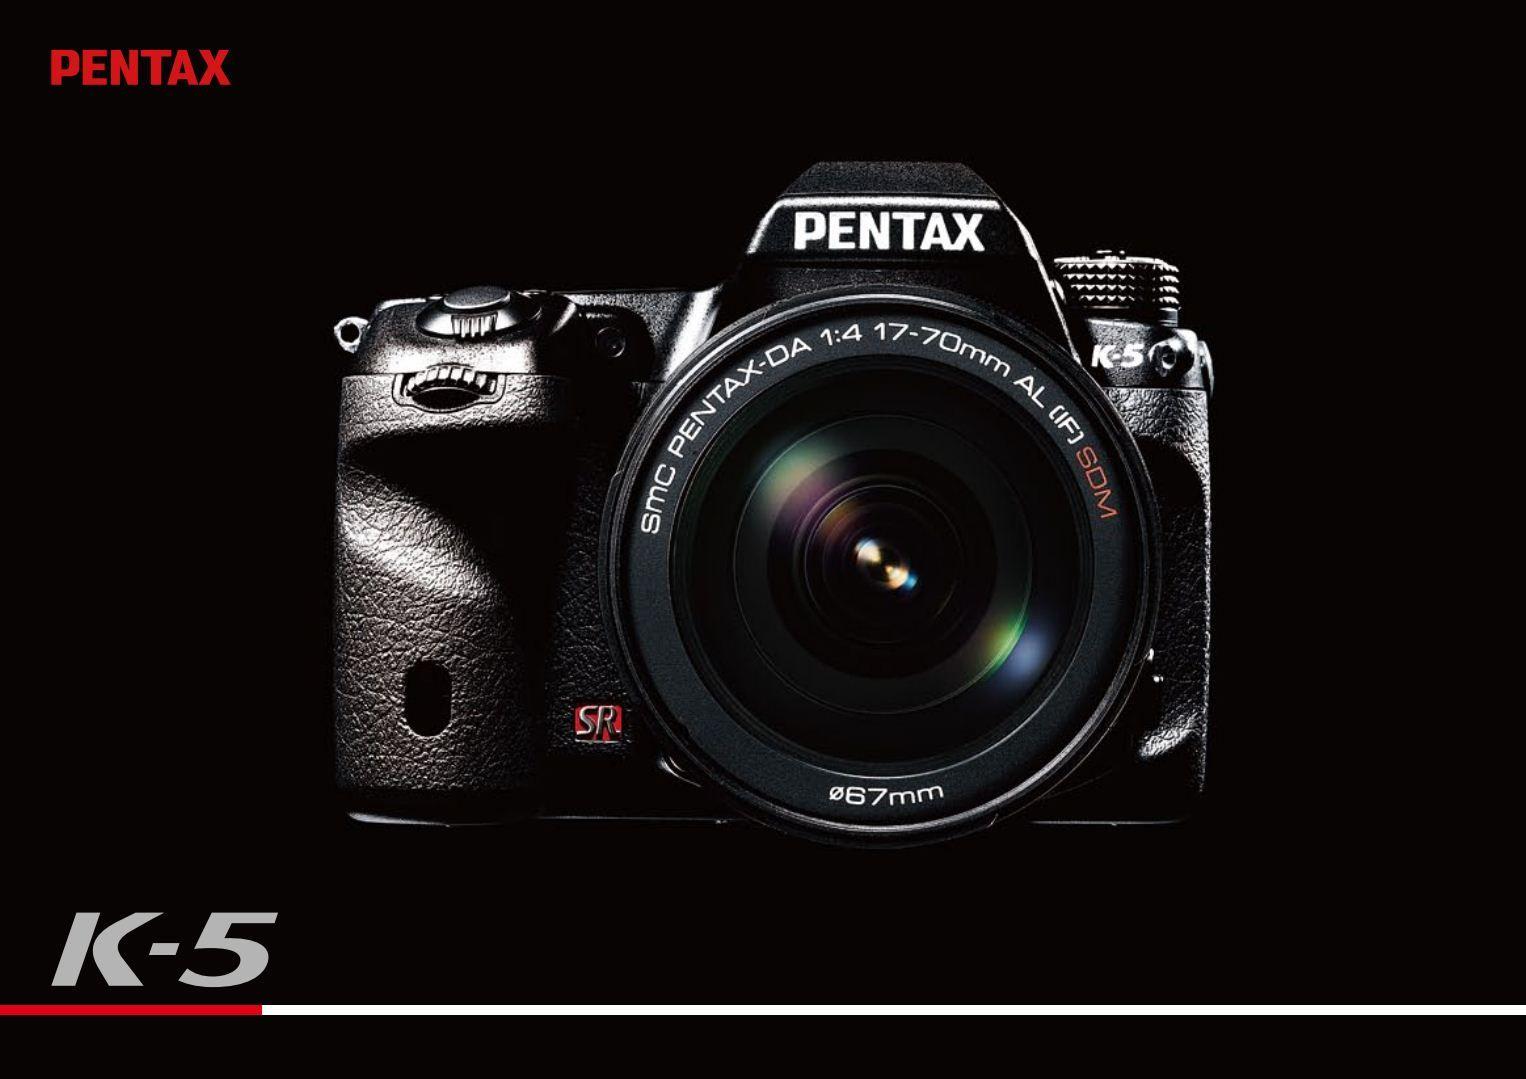 PENTAX K-5 Japanese Catalogue